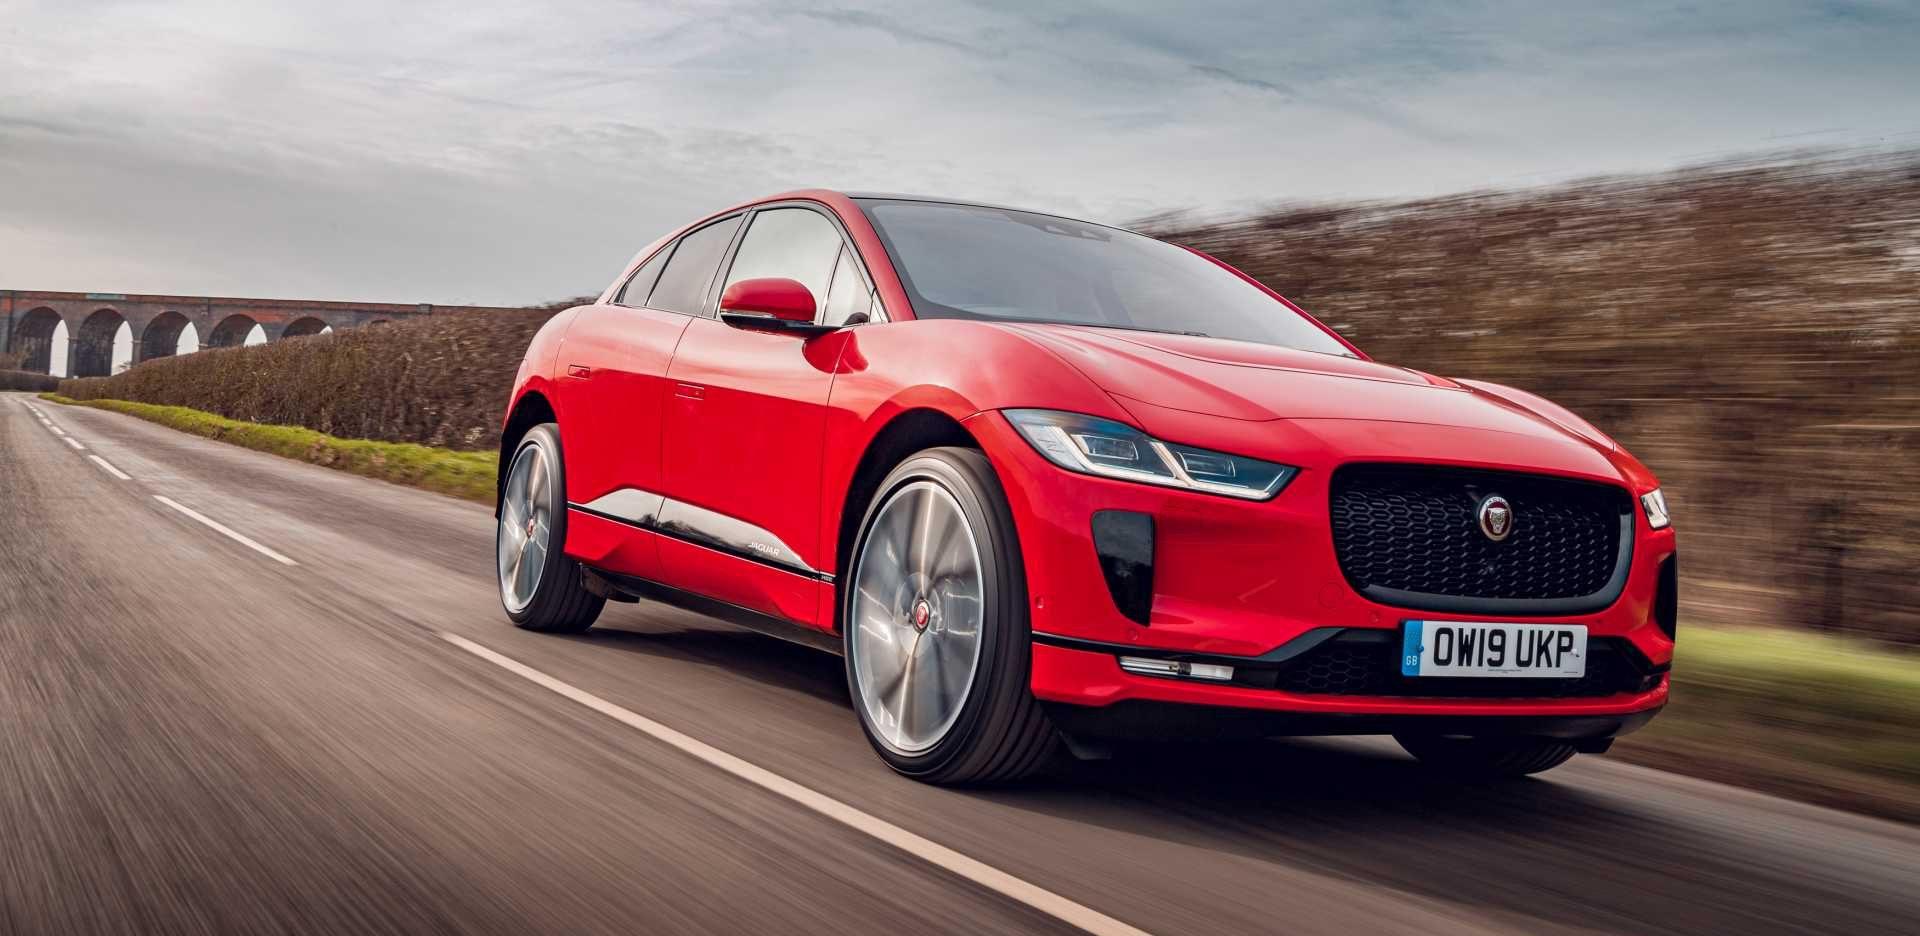 Jaguar_I-PACE_HSE_EV_400_AWD_Photon_Red_2306